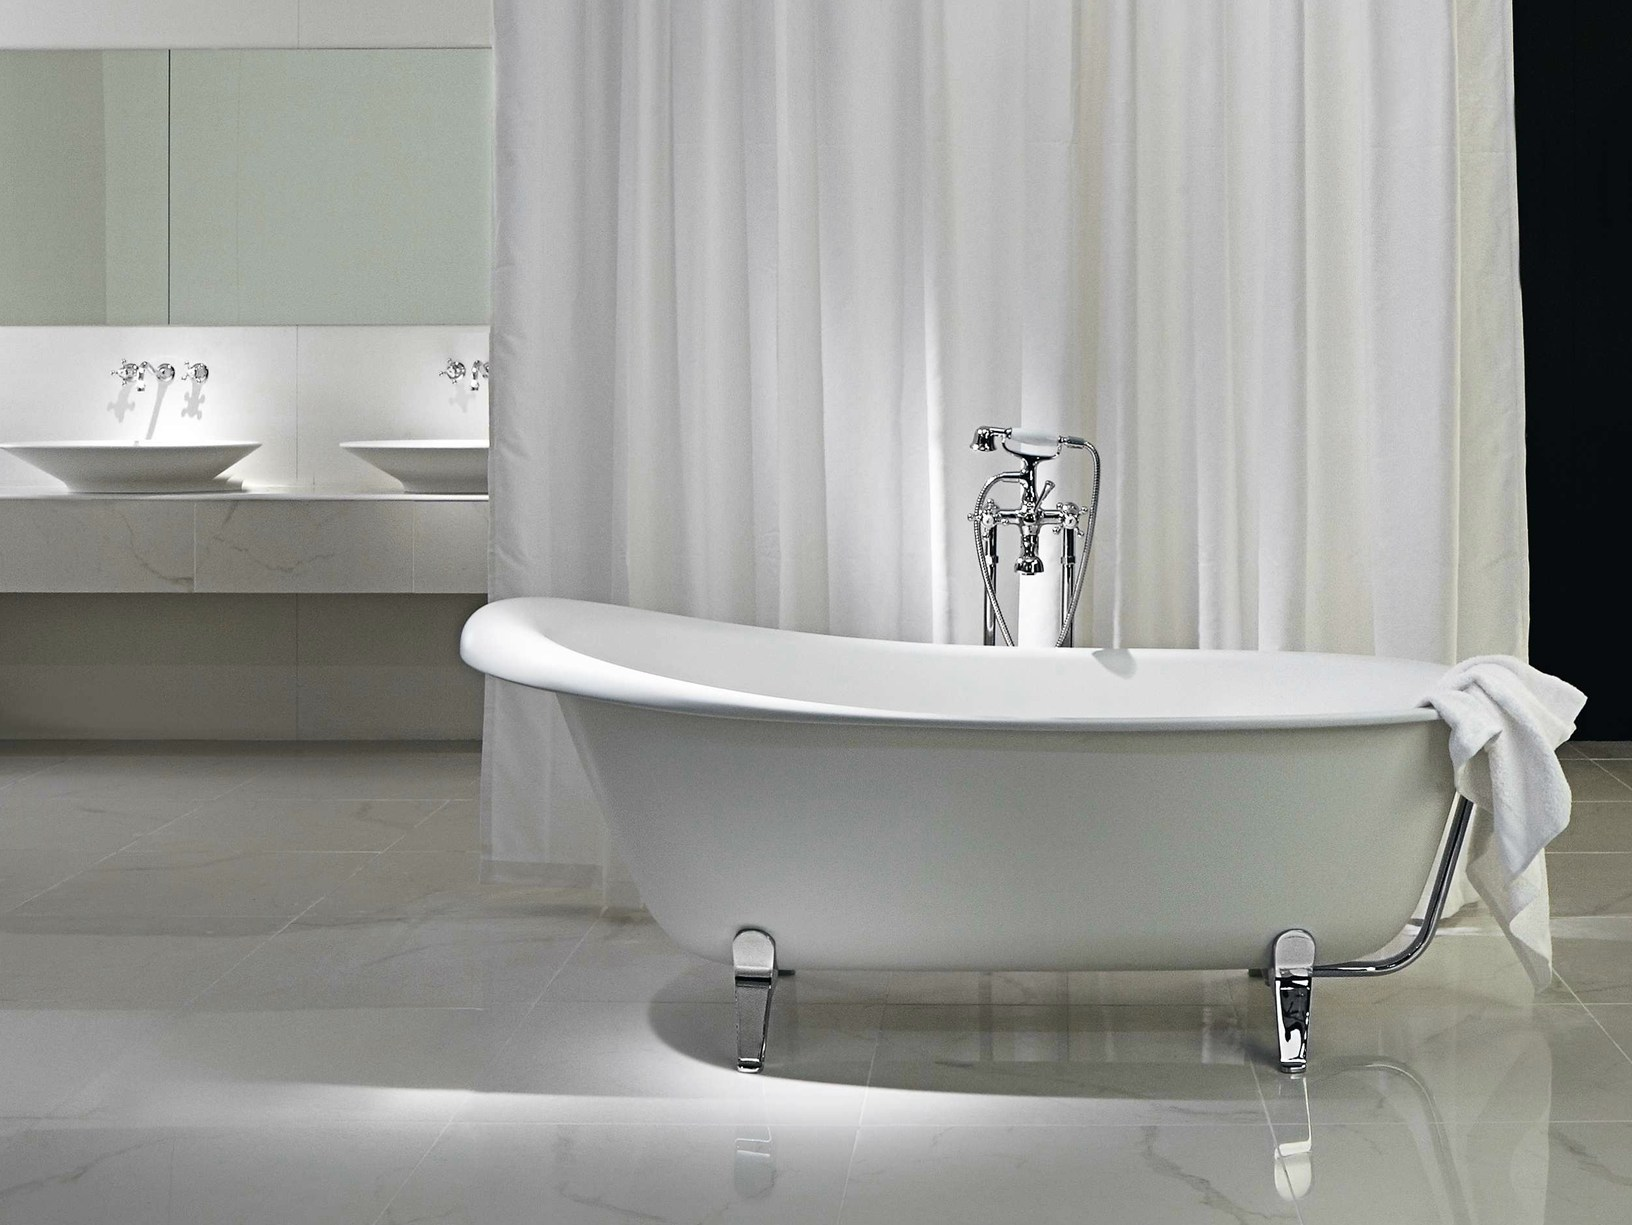 Vasca Da Bagno Kos Prezzi : Kos vasche da bagno vasche da bagno edilceramiche di maccanò